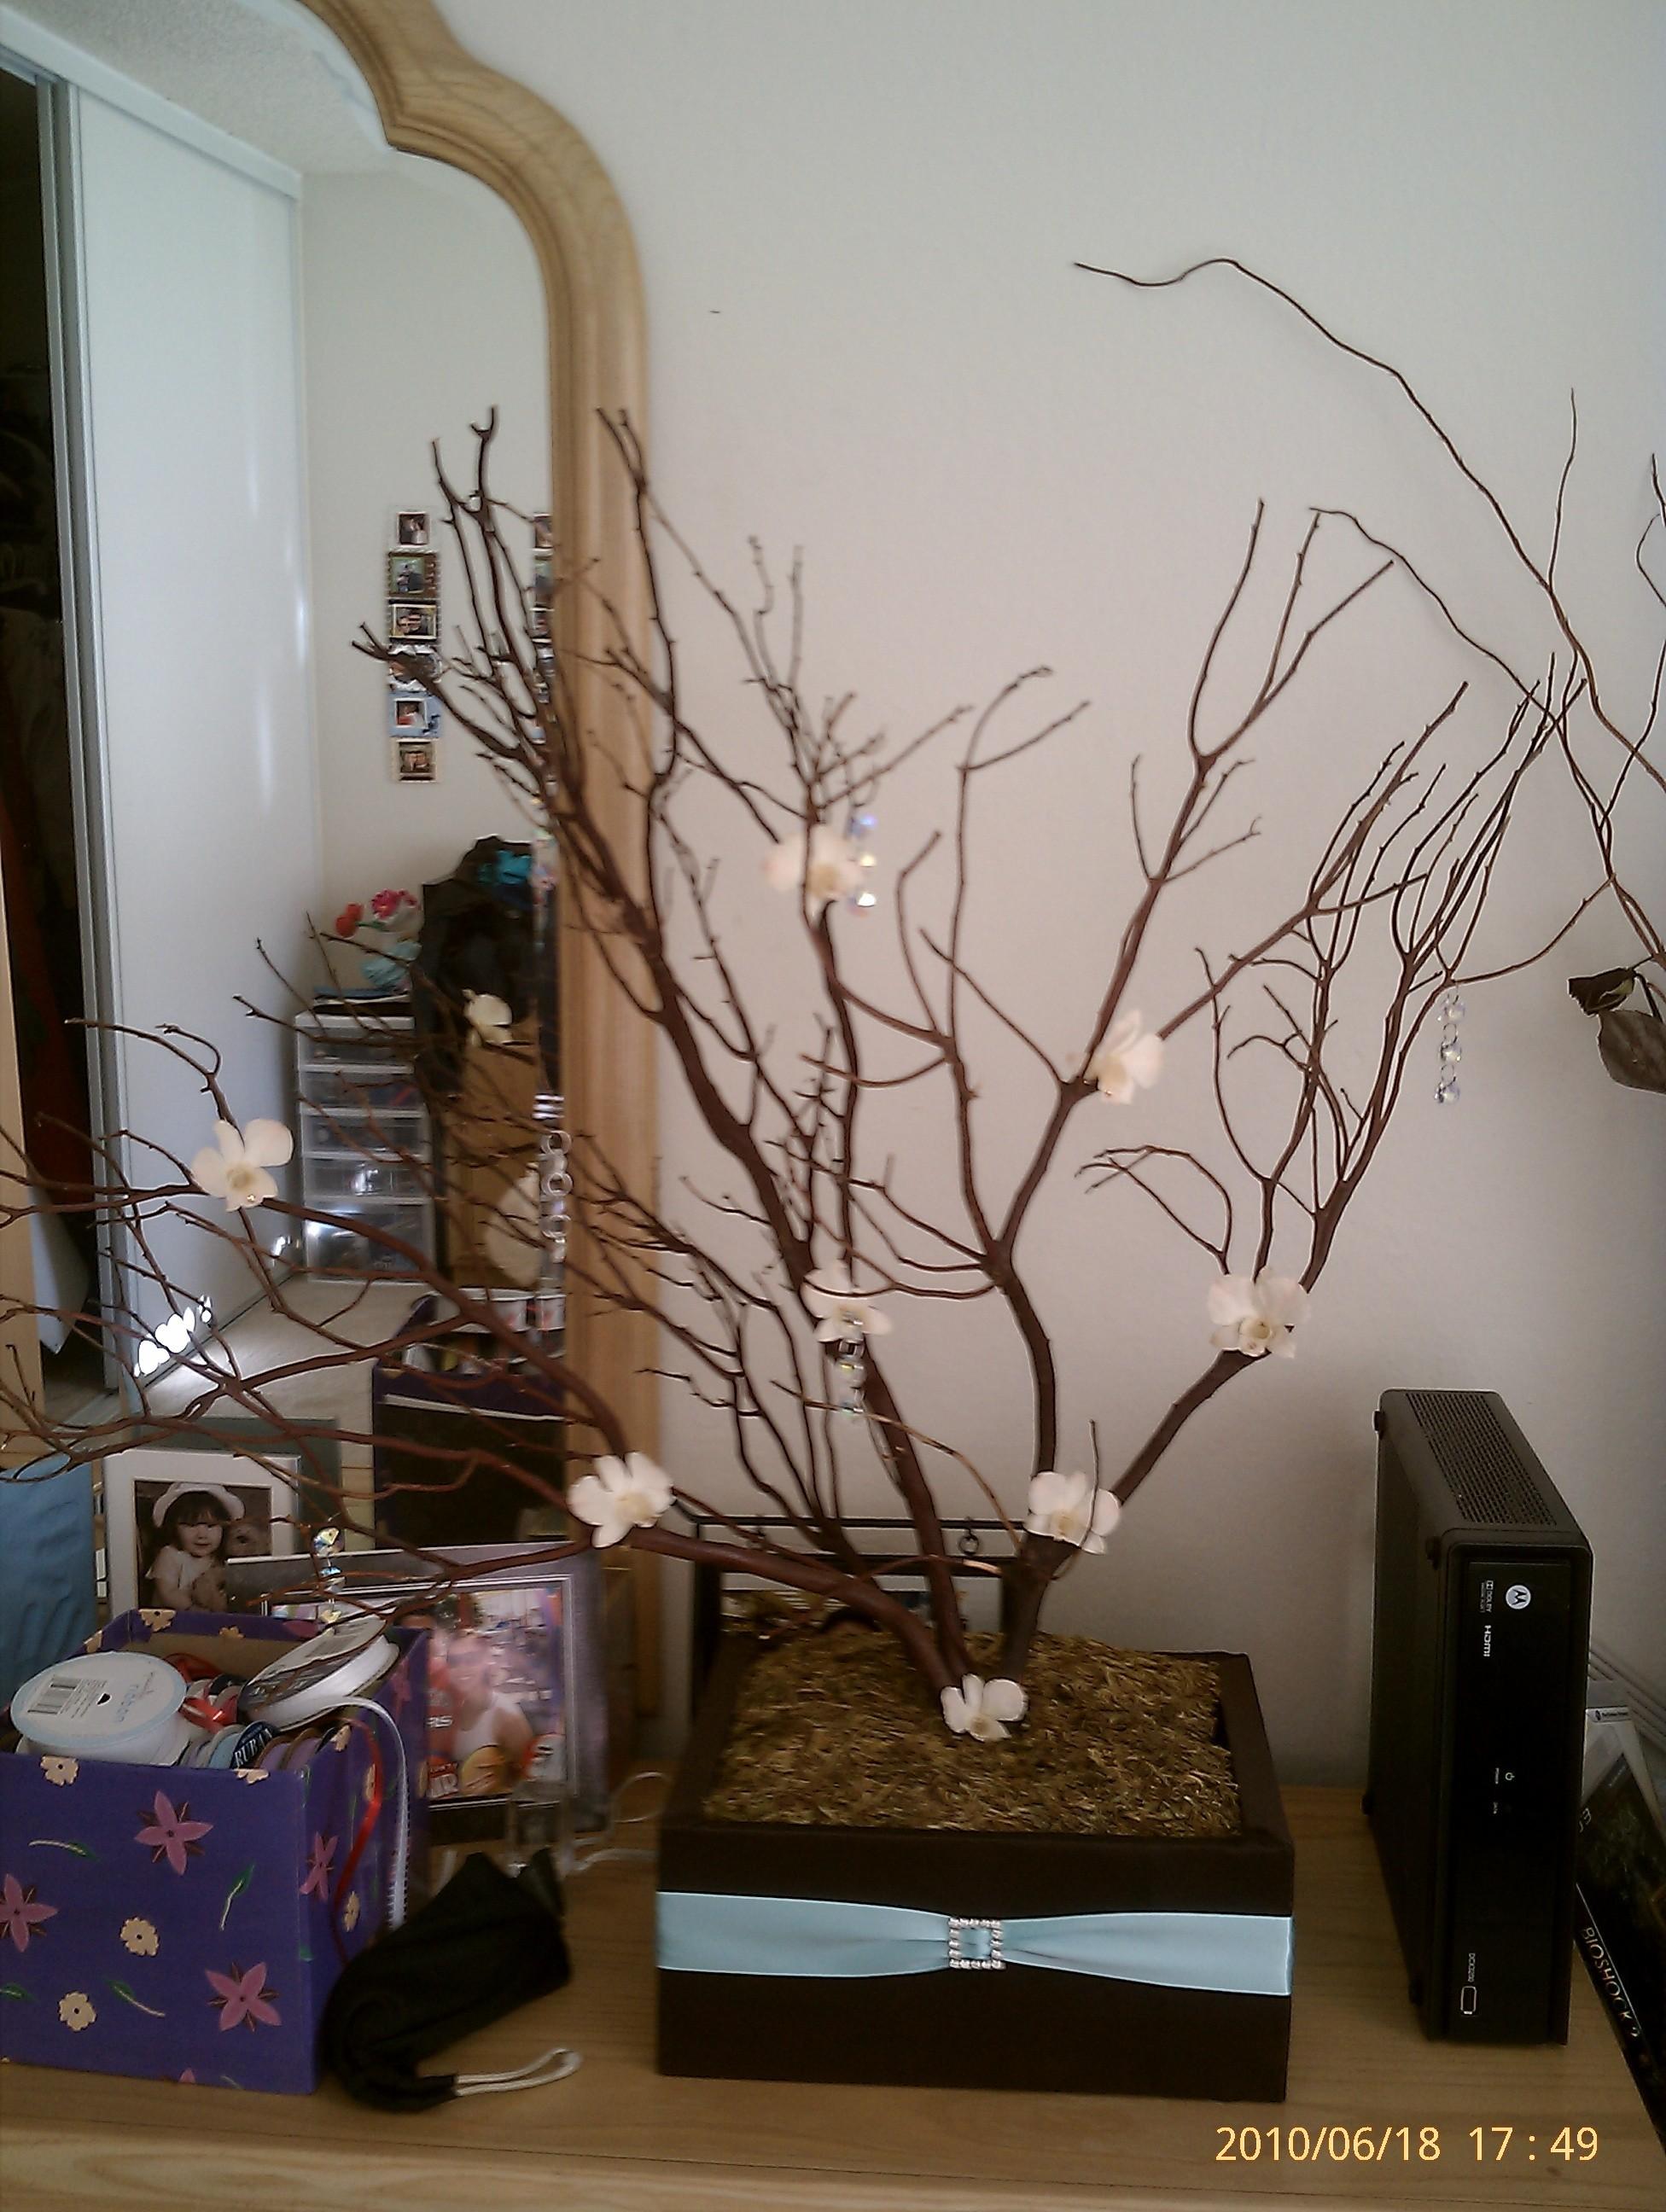 blue, brown, Tree, Tiffany, Manzanita, Wish